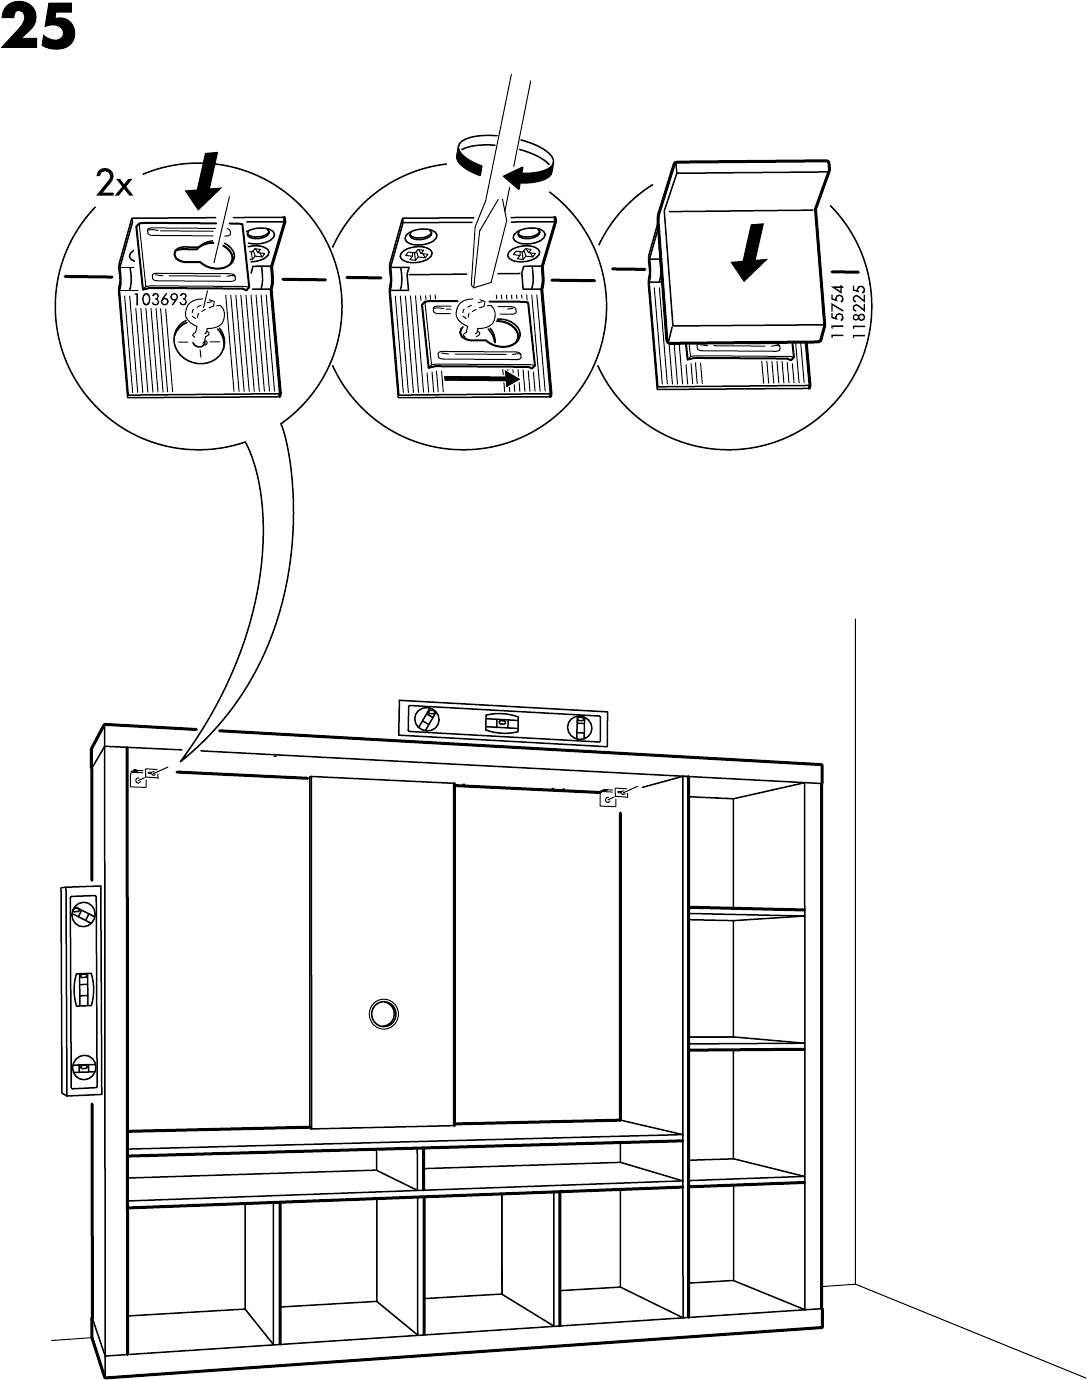 Expedit Tv Kast.Handleiding Ikea Expedit Tv Kast Pagina 25 Van 32 Alle Talen